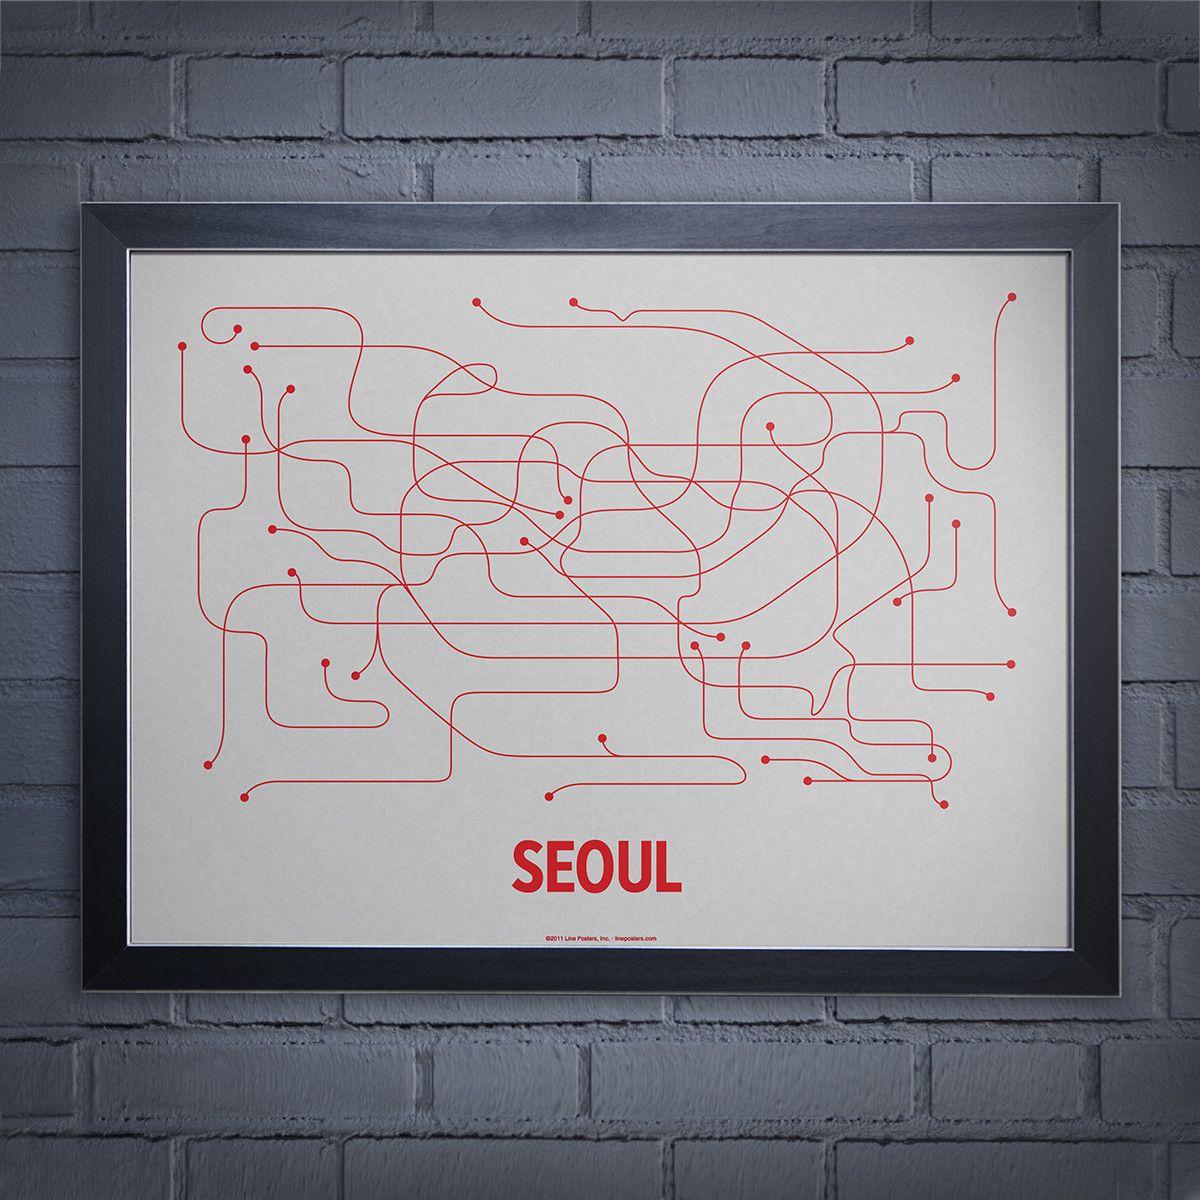 Lineposterscom Seoul subway map Lineposterscom Seoul subway